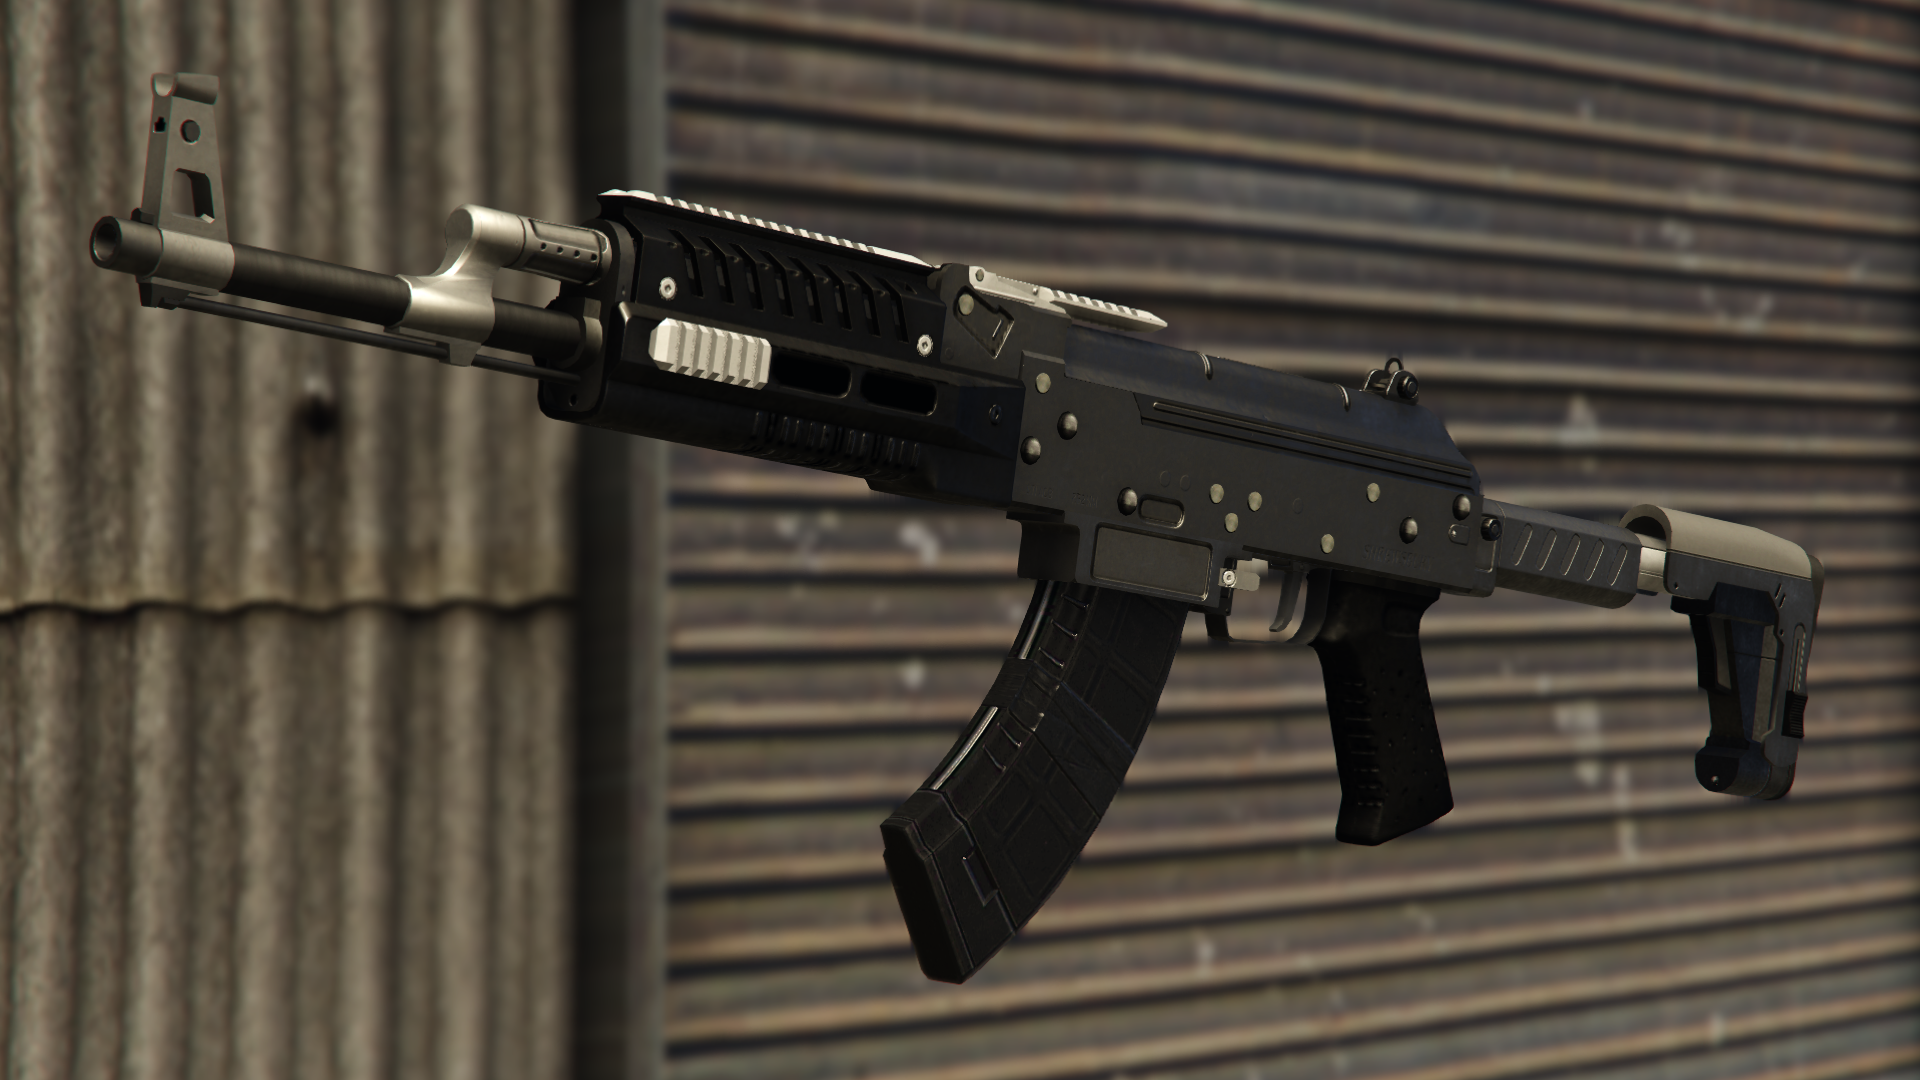 Letna weapons онлайн